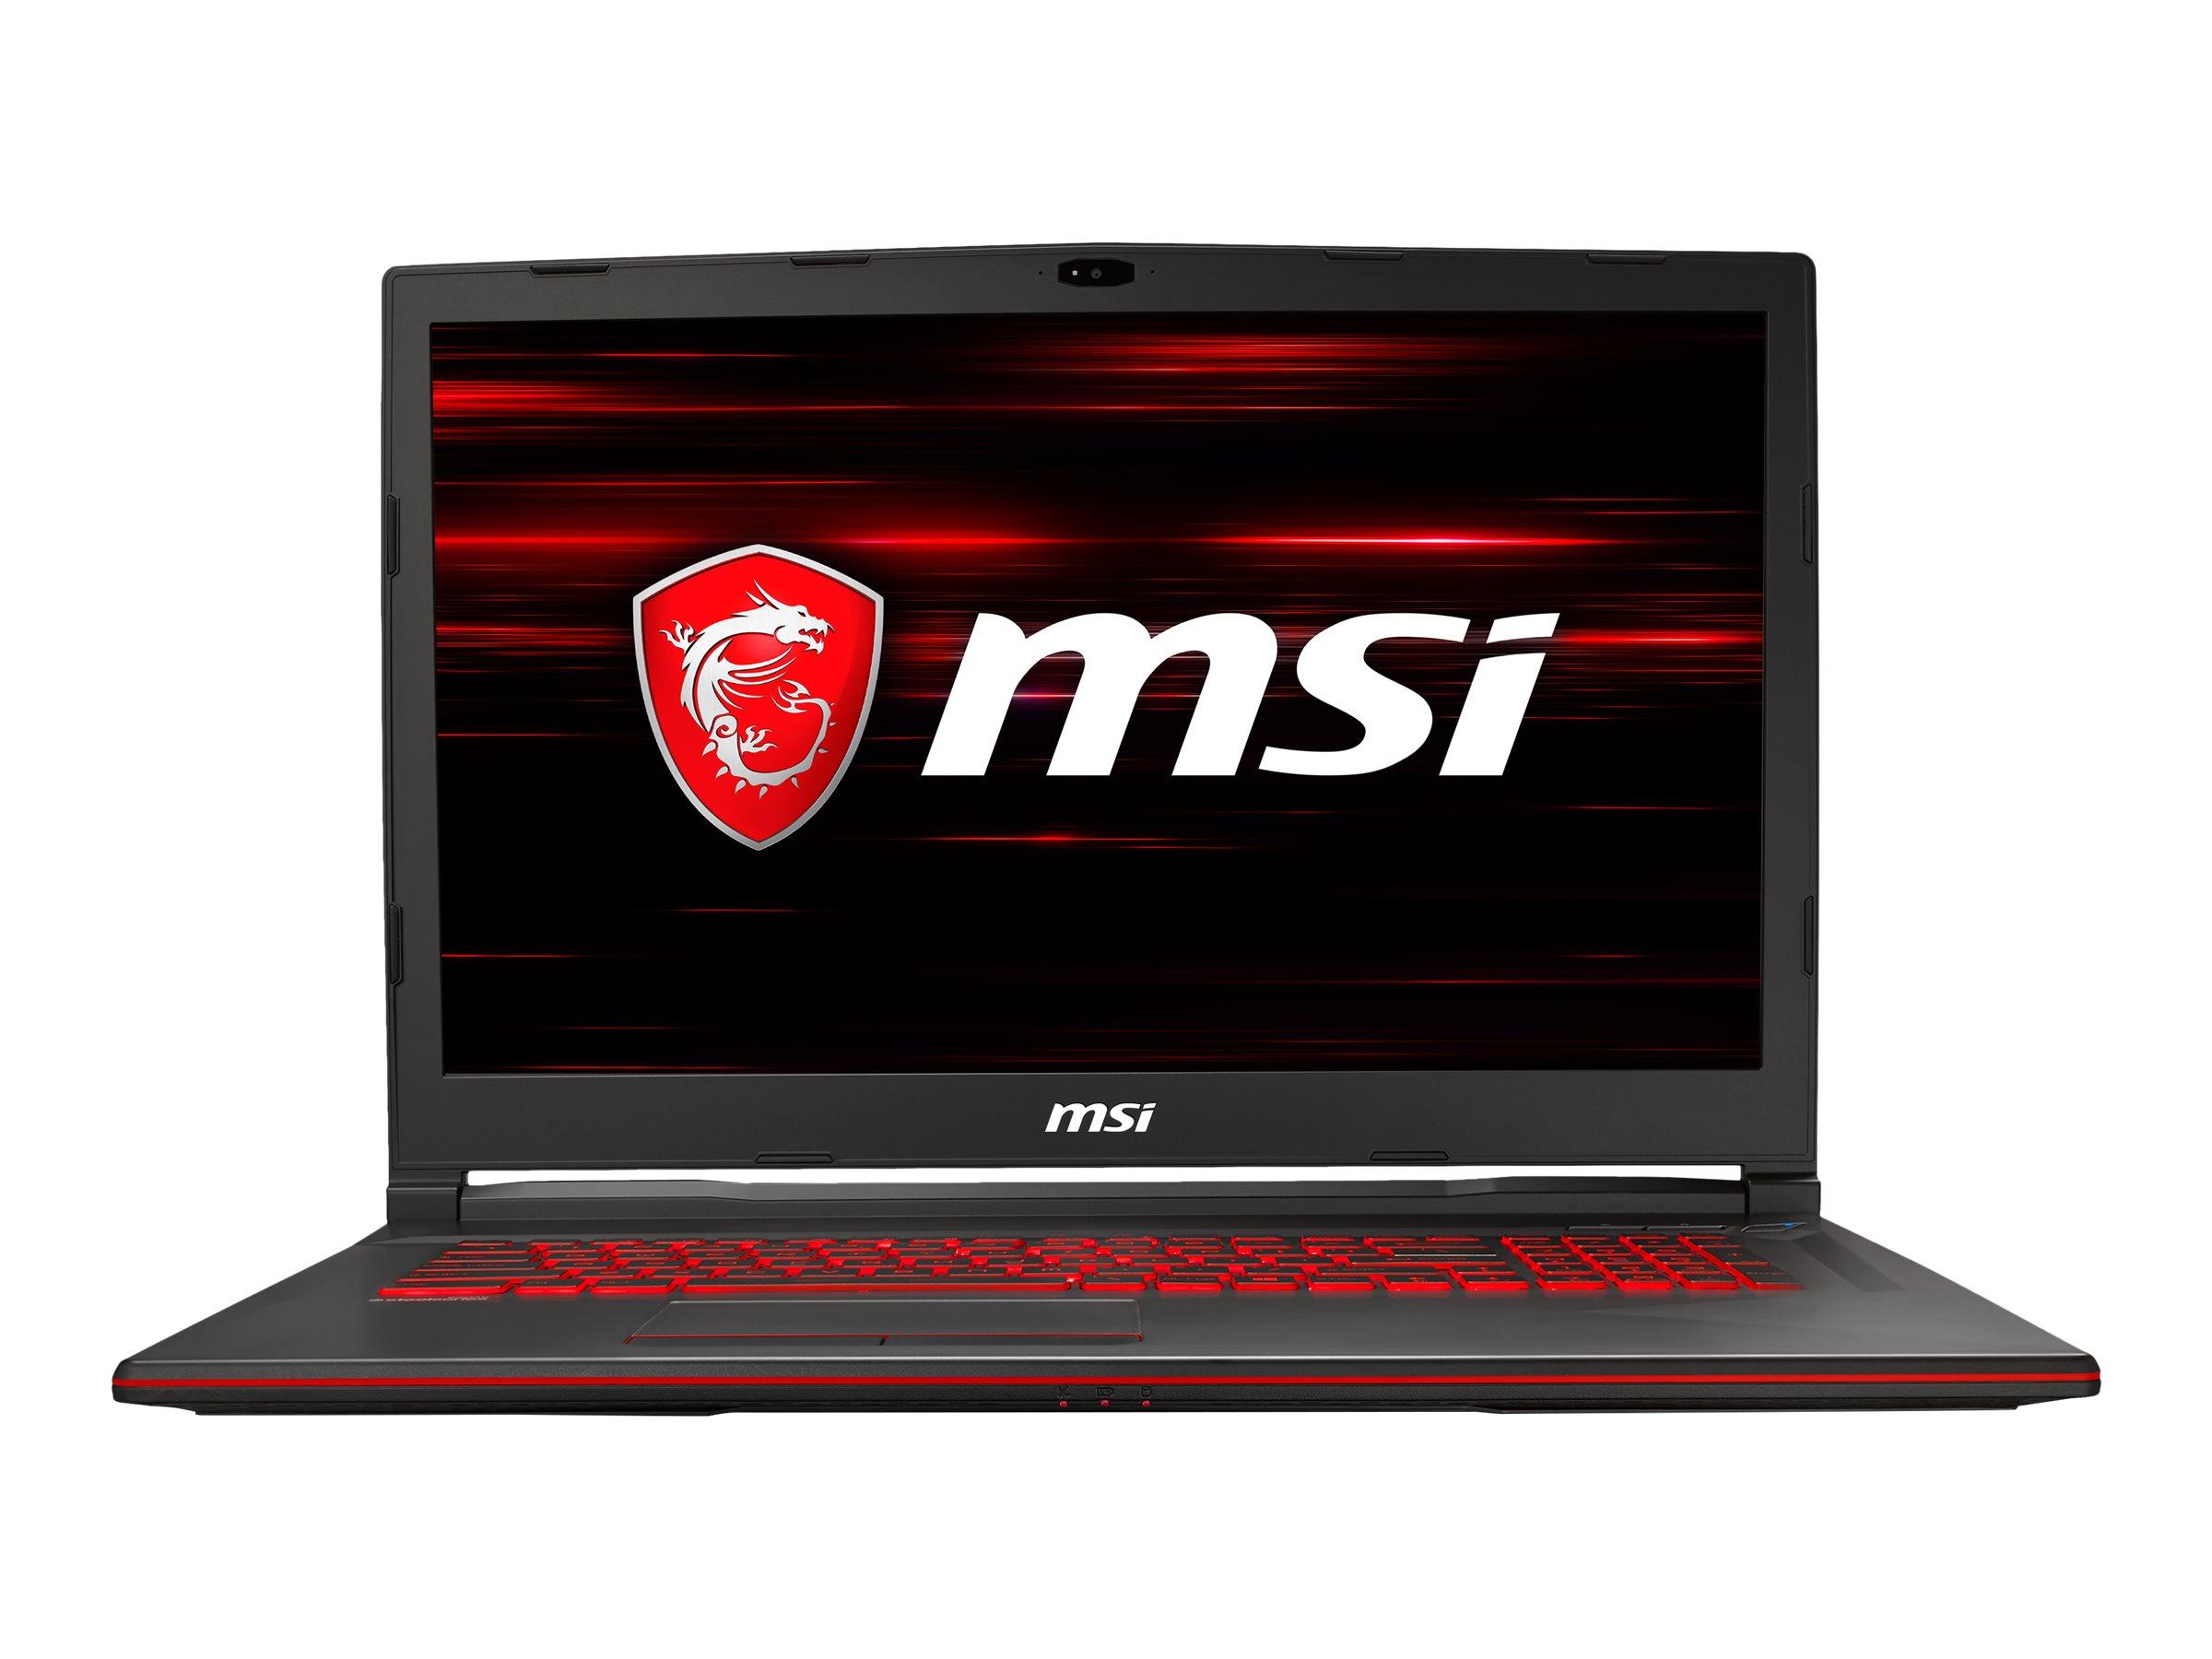 "MSI GL73 8SD 223DE - Core i7 9750H - Windows 10 Home - 16 GB RAM - 512 GB SSD NVMe - 43.9 cm (17.3"")"